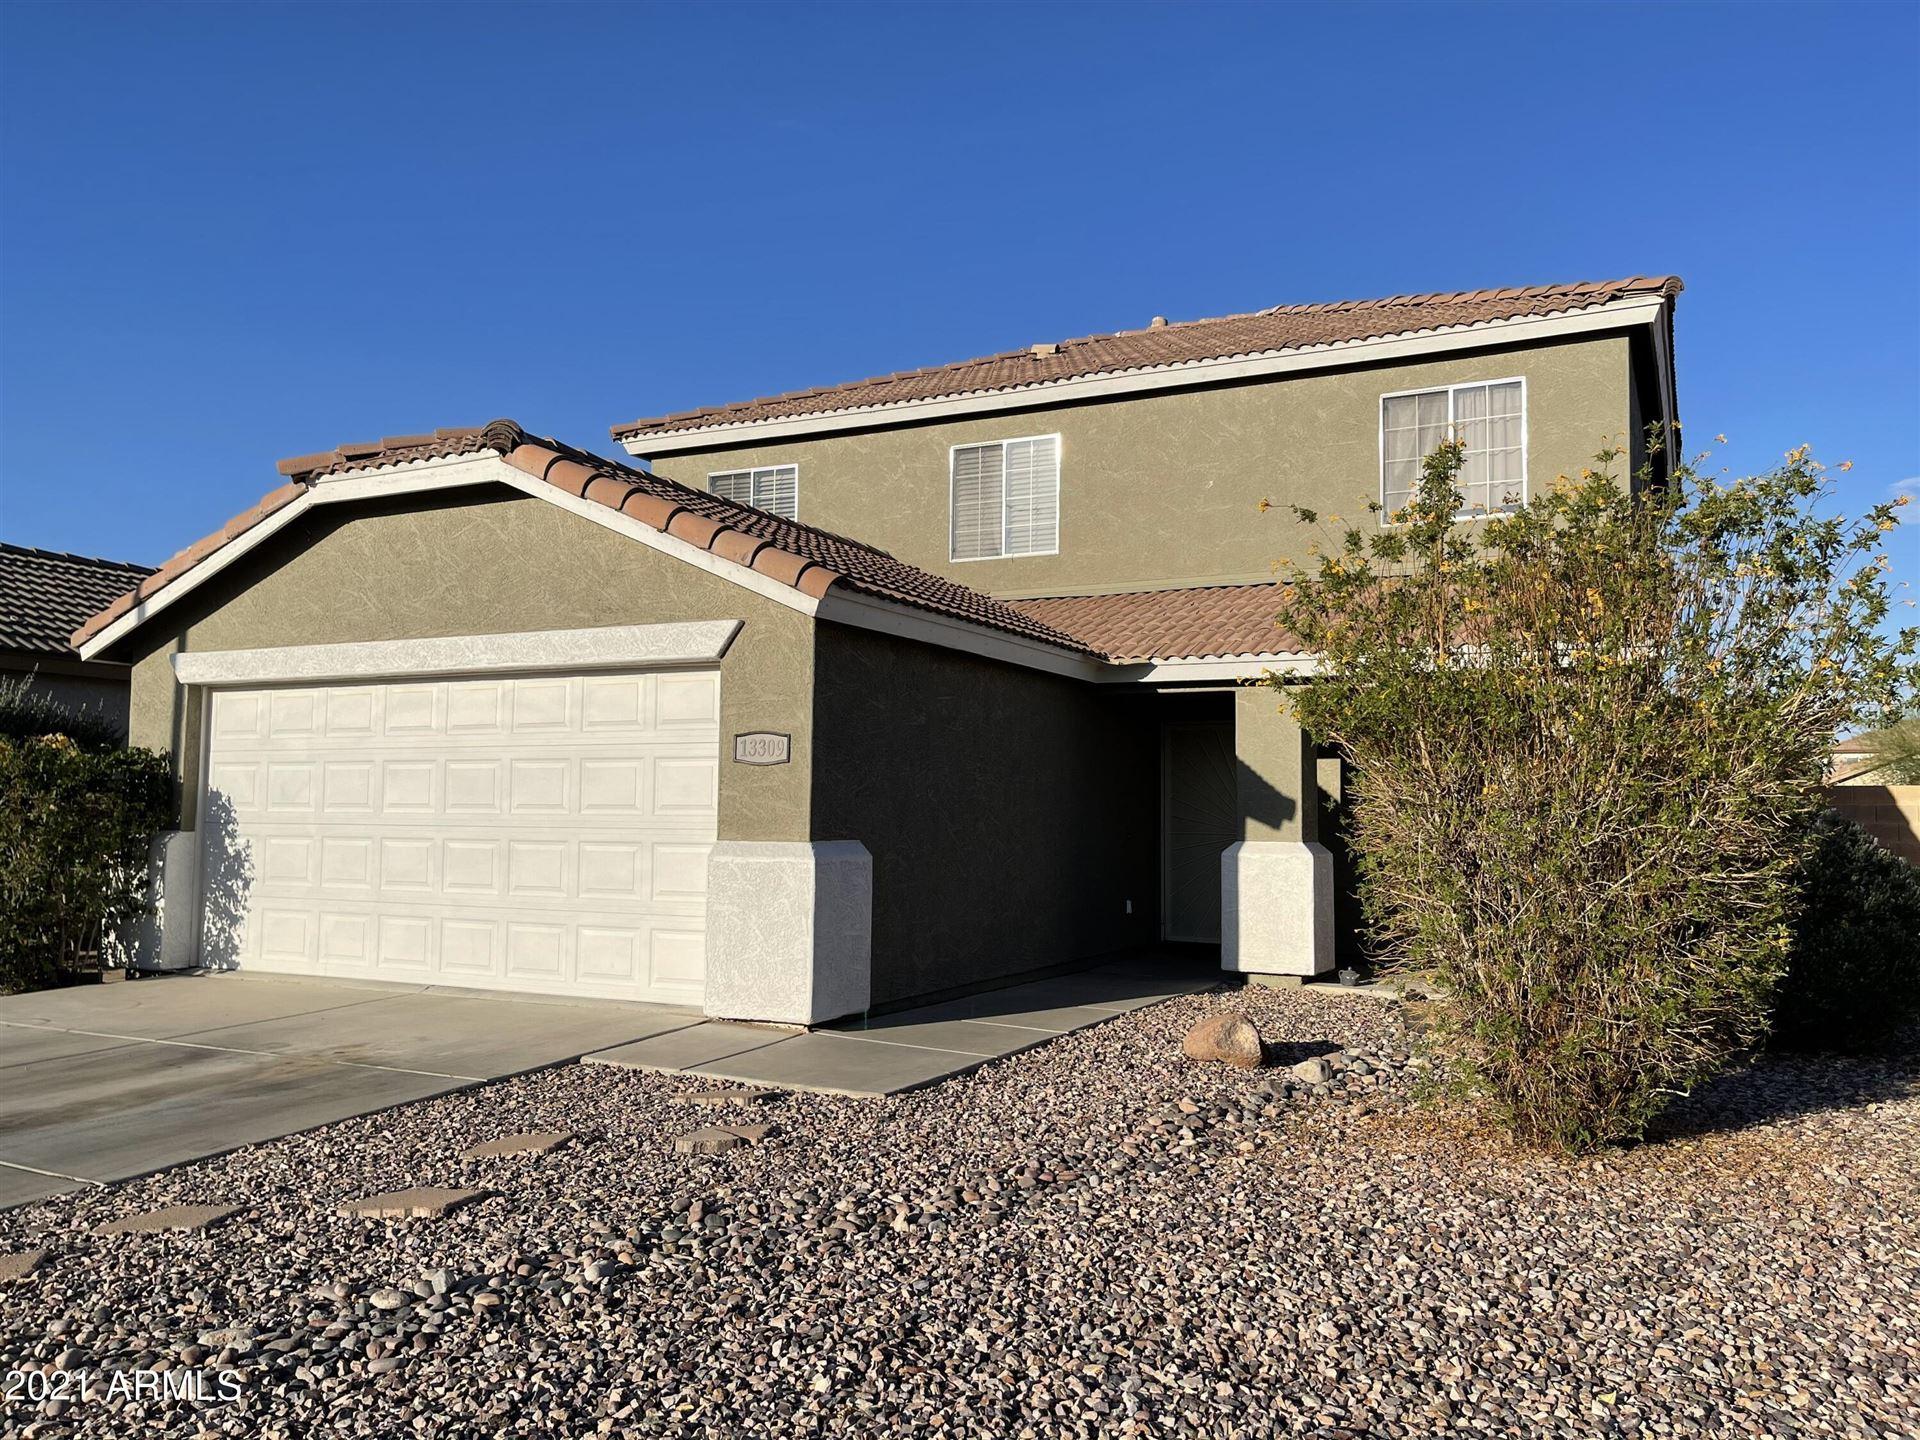 Photo of 13309 N 124TH Avenue, El Mirage, AZ 85335 (MLS # 6245589)